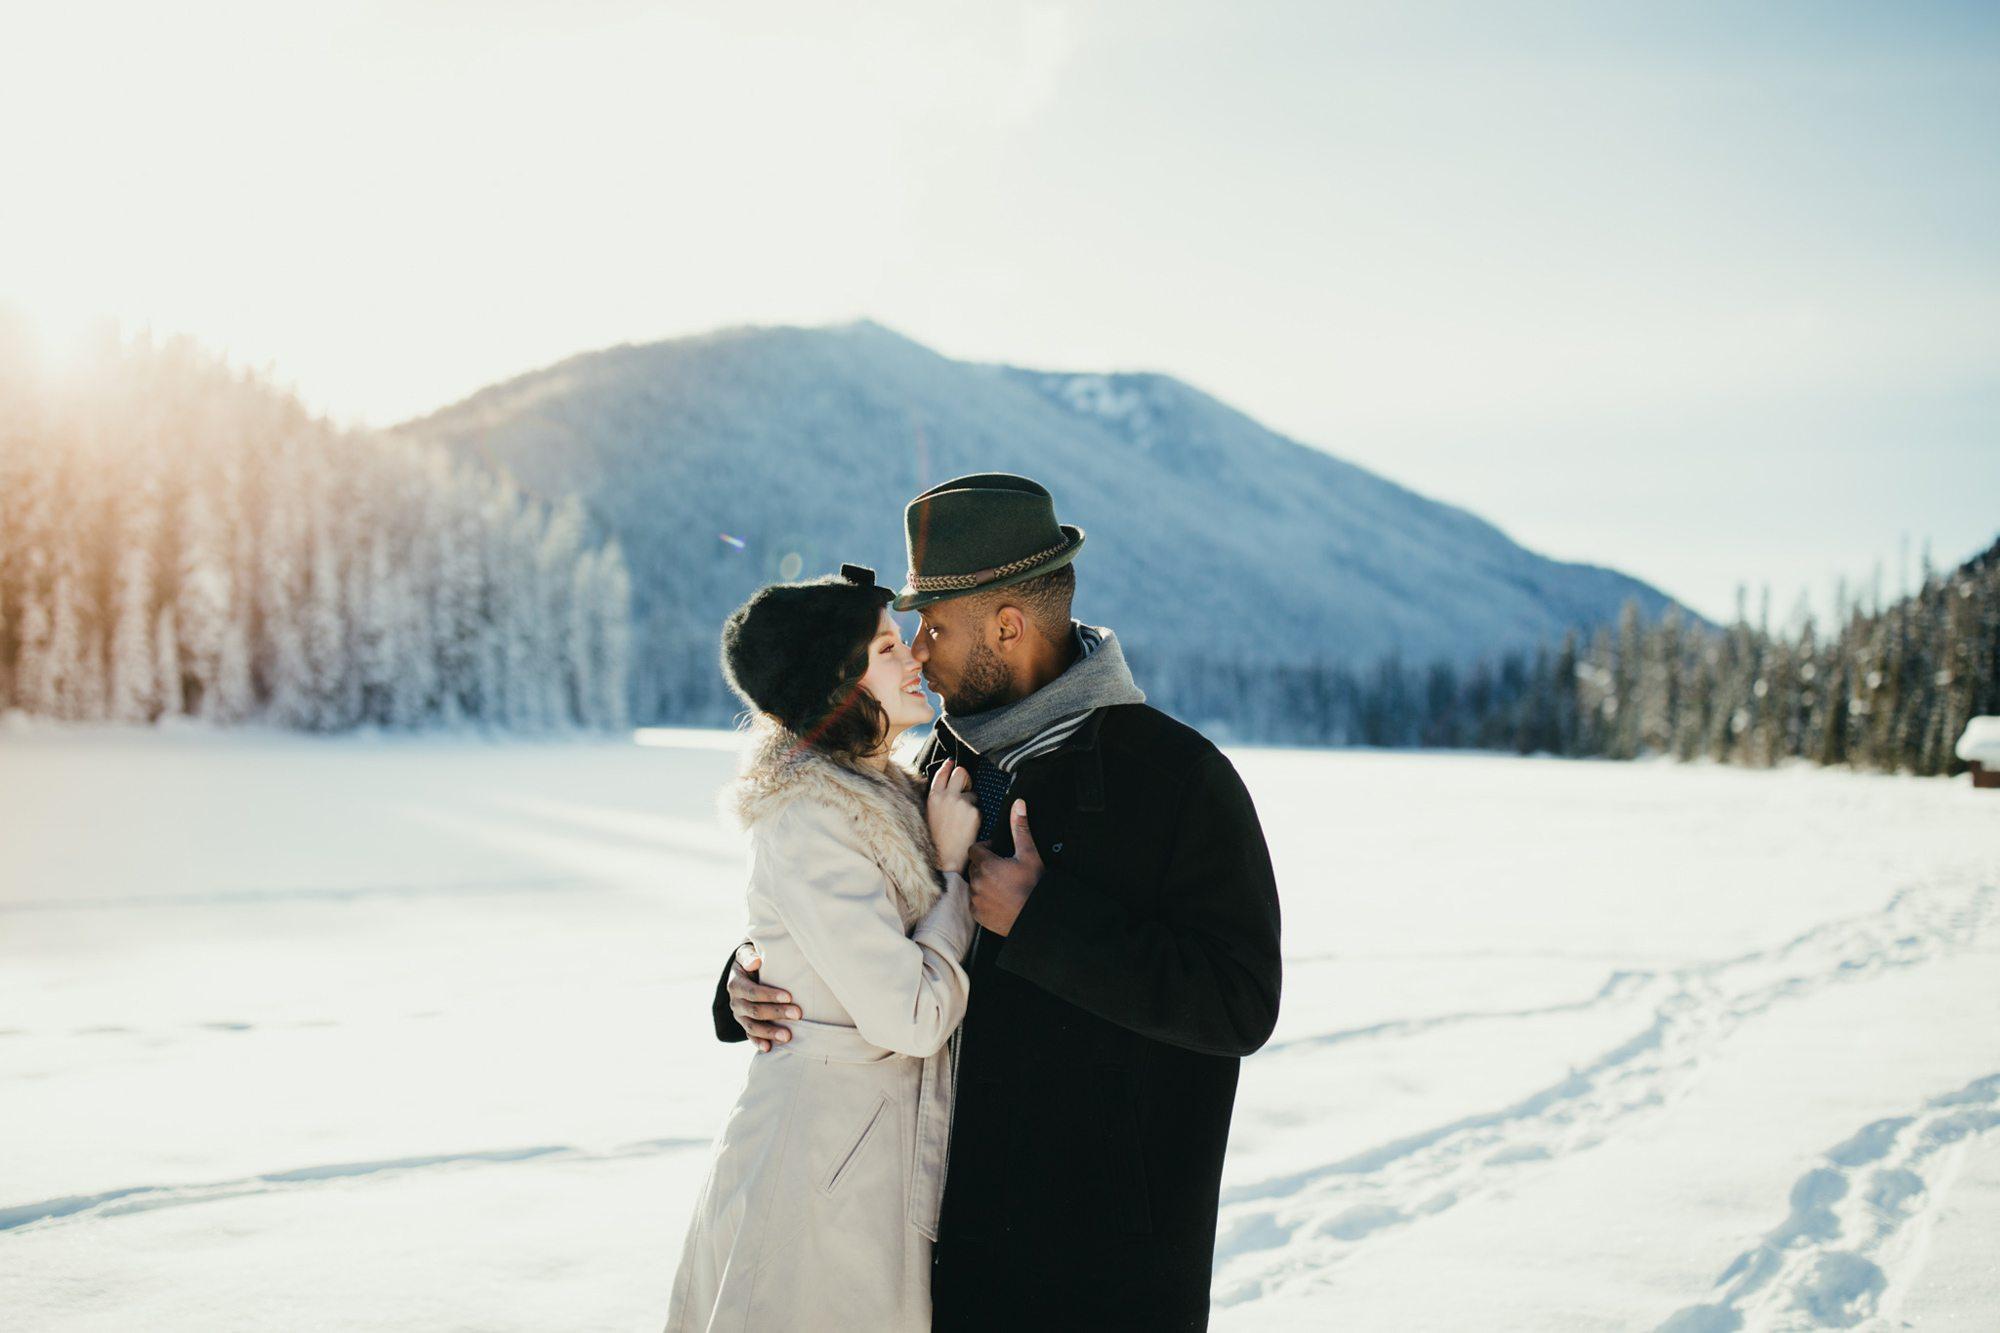 022-adventure-engagement-photographer